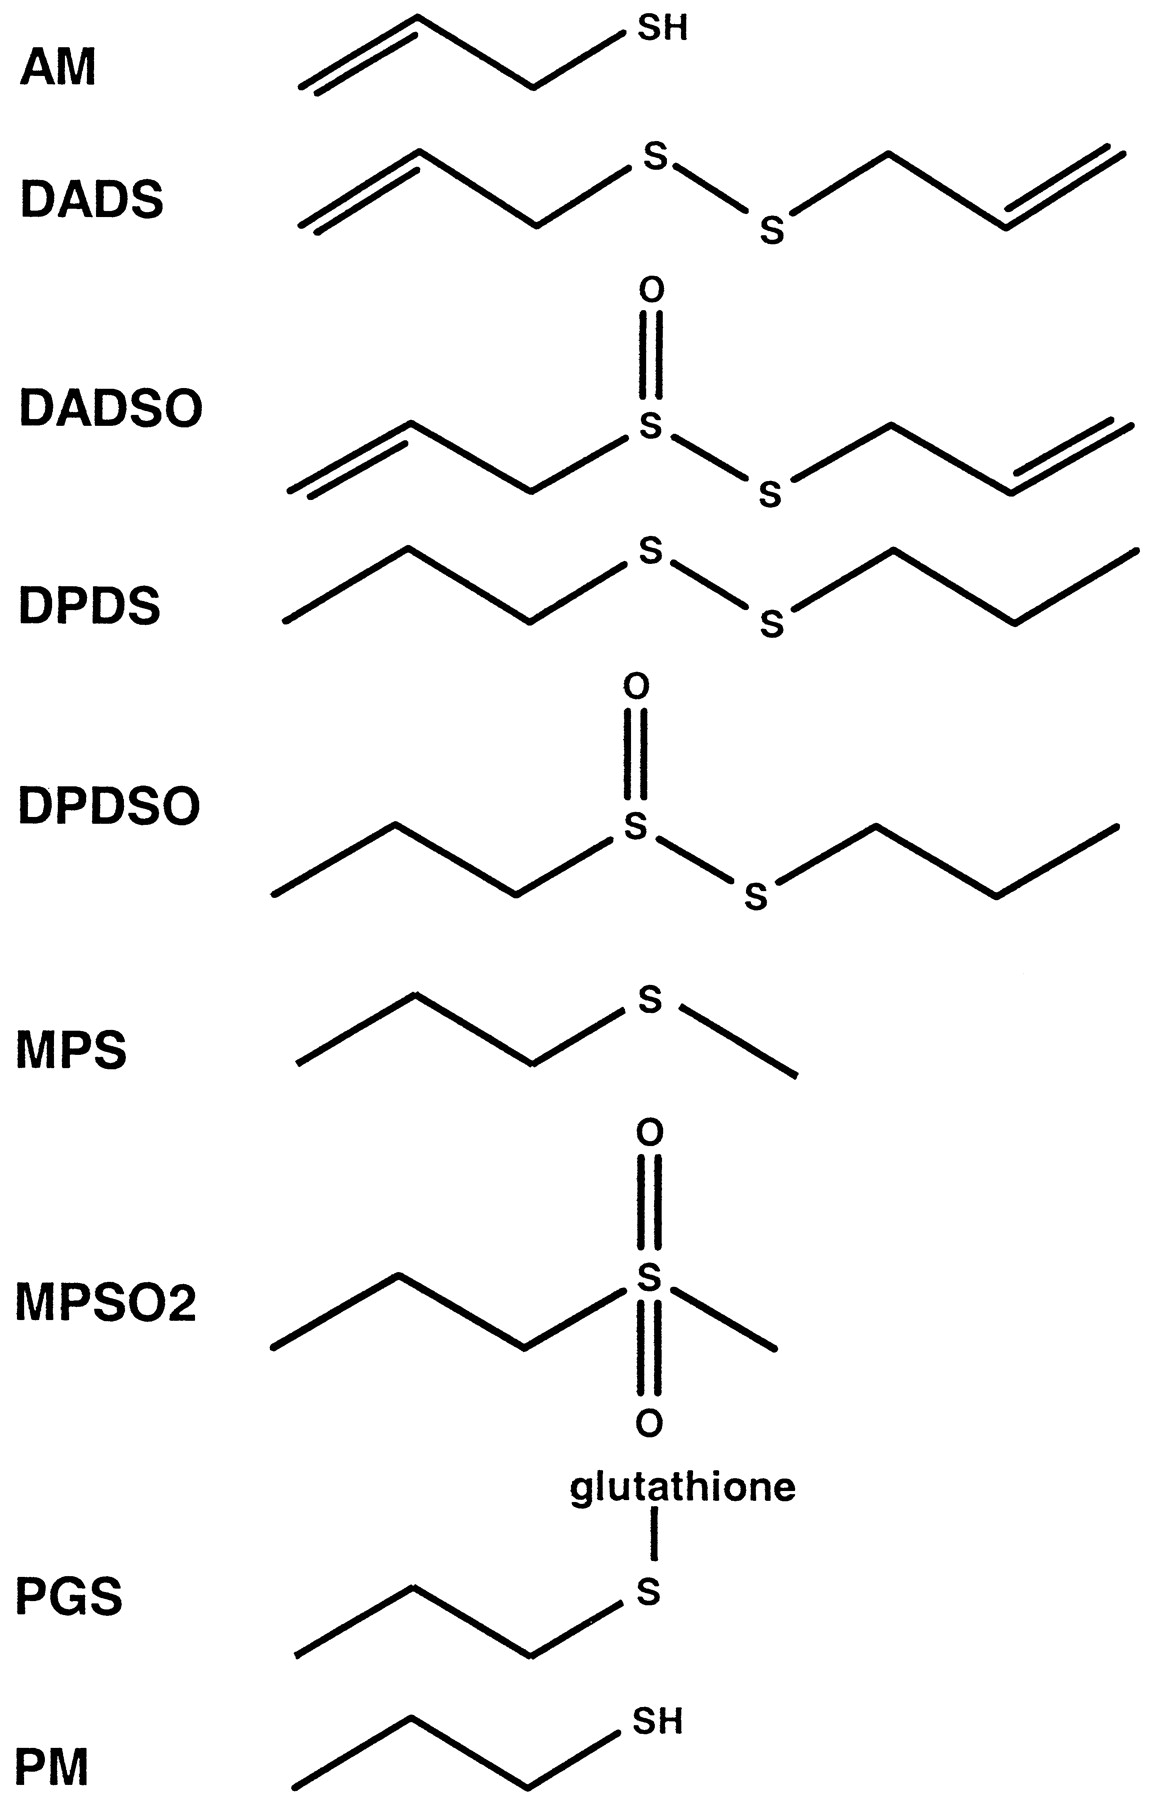 Rat Liver Diagram Schematic Wiring Diagrams